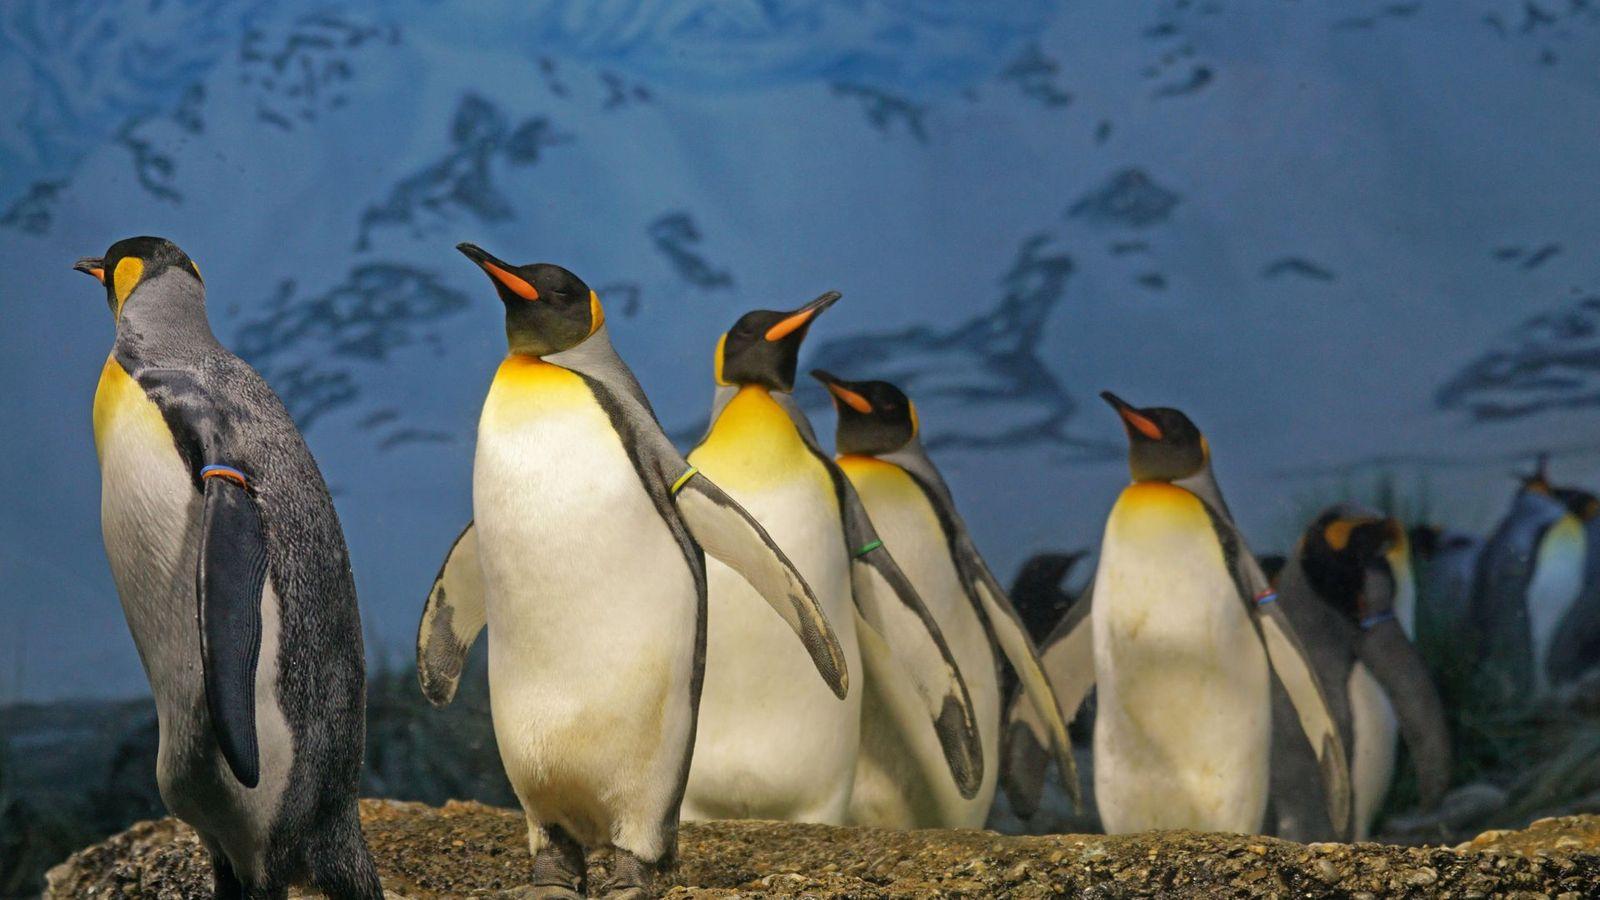 King Penguin Daylight Outdoor HD Wallpaper   Wallpaper Stream 1600x900